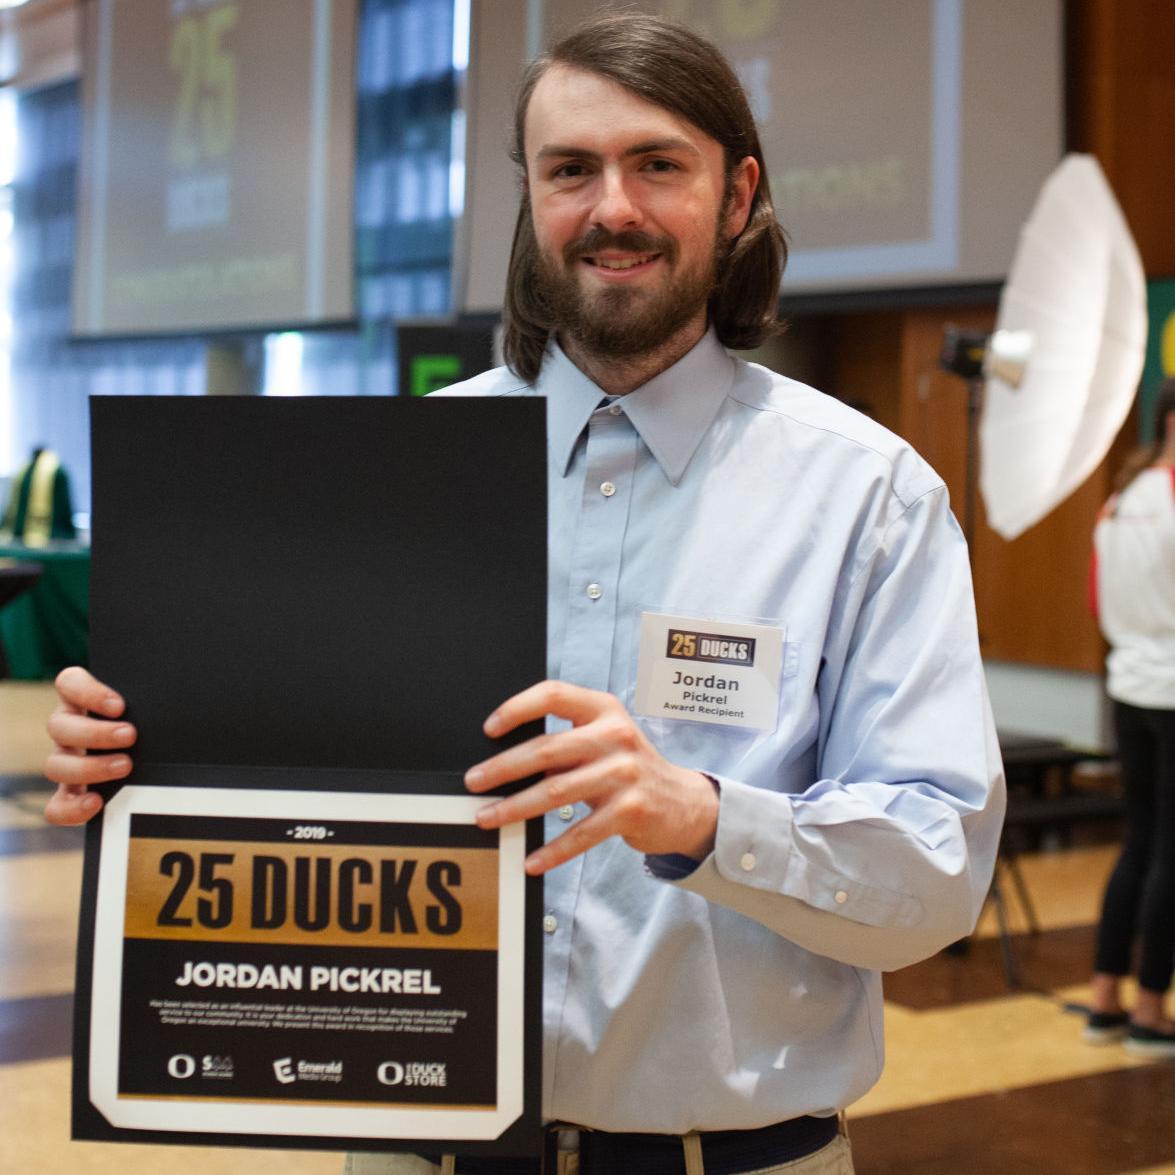 25 Ducks | 2019 Event